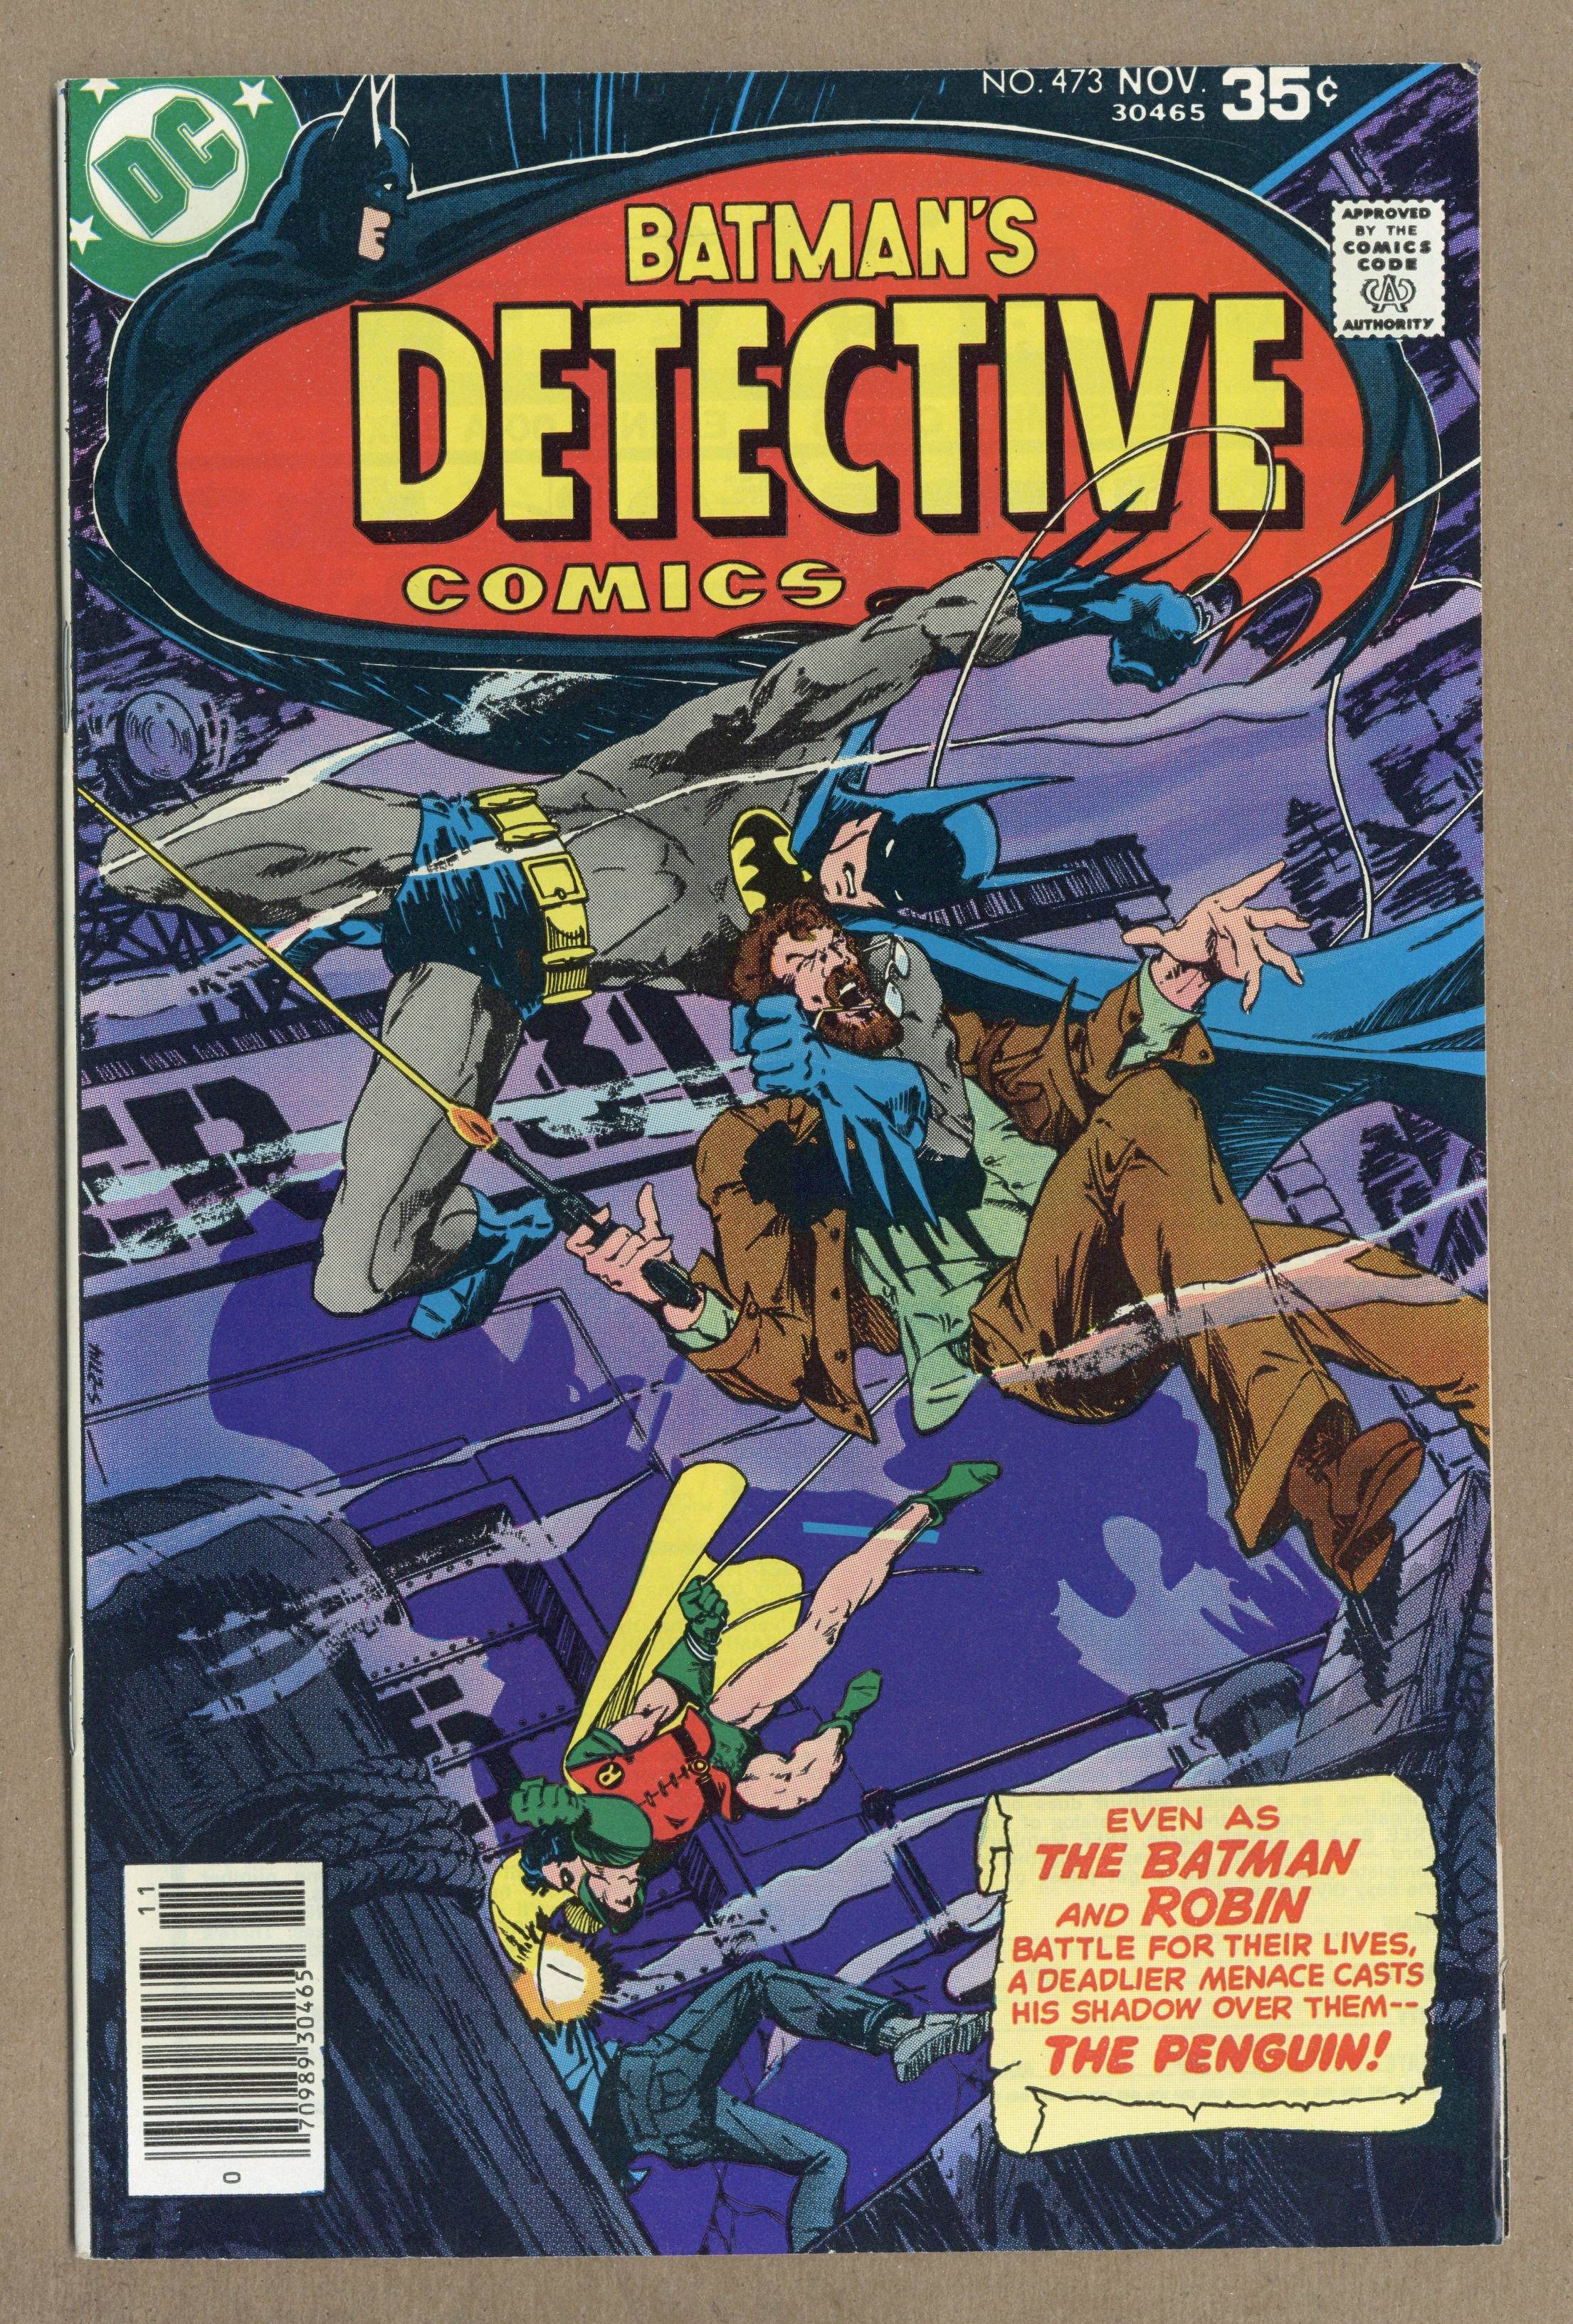 Action Comics #468 FN 1977 Stock Image